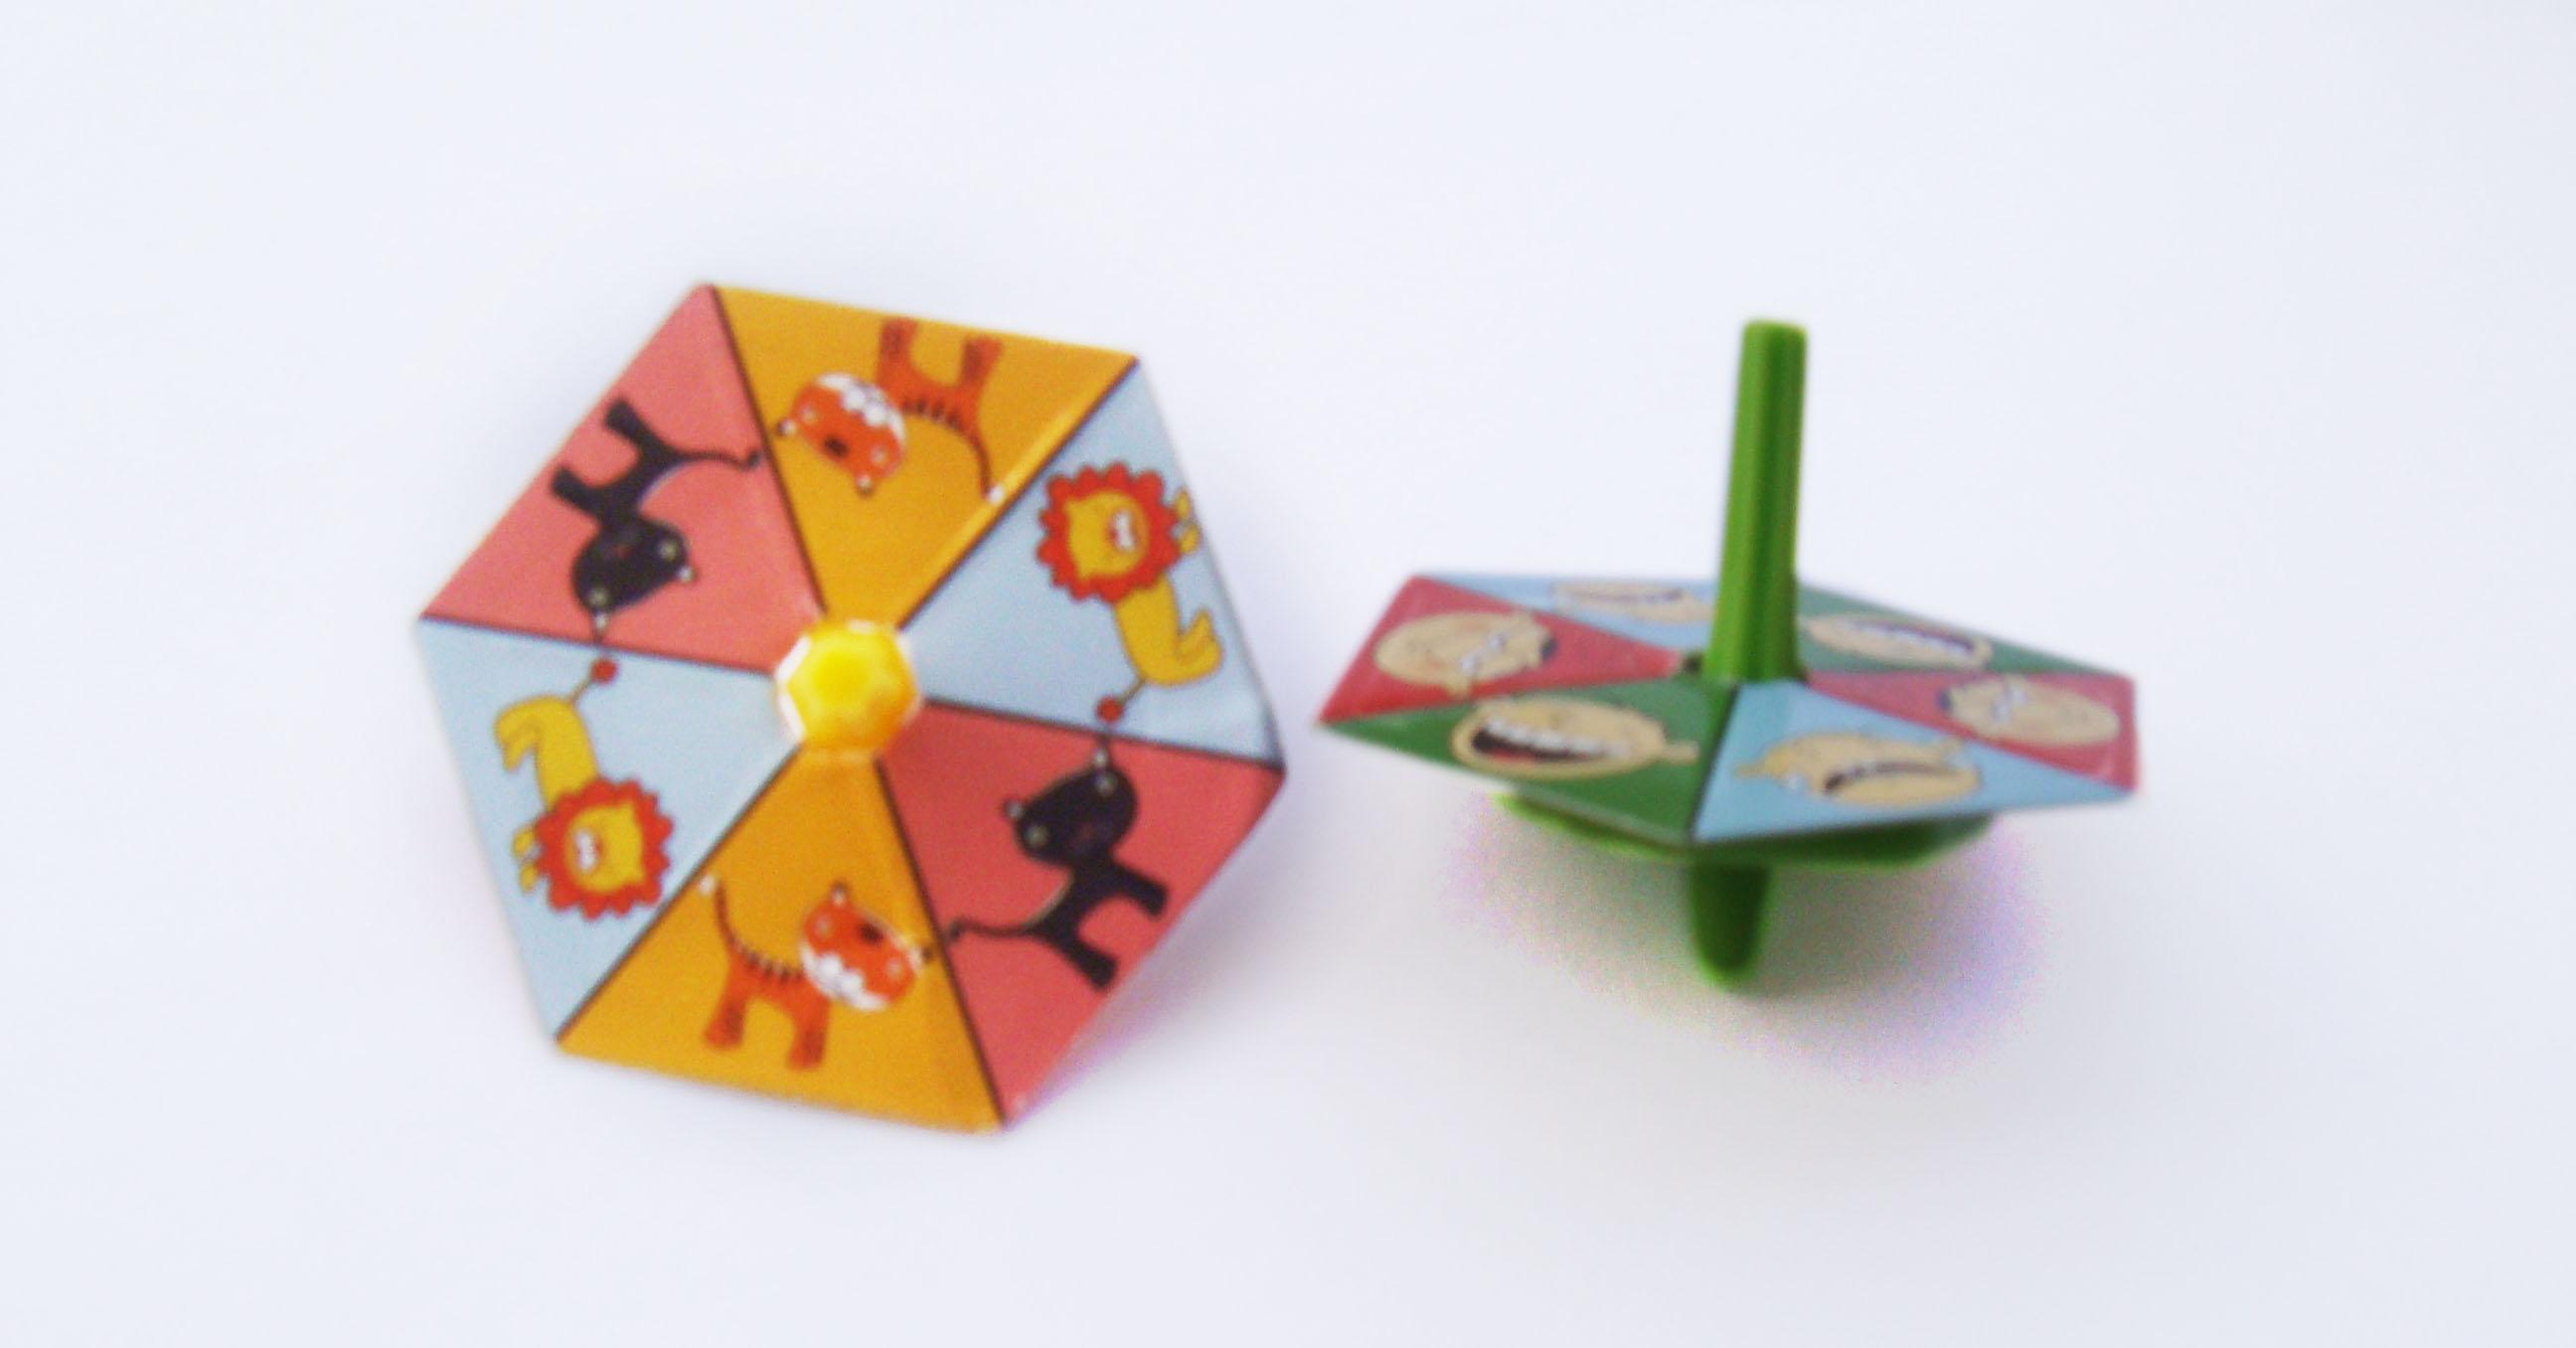 Jos And Toys : Kinder joy surprise toys by toy designer suhasini paul